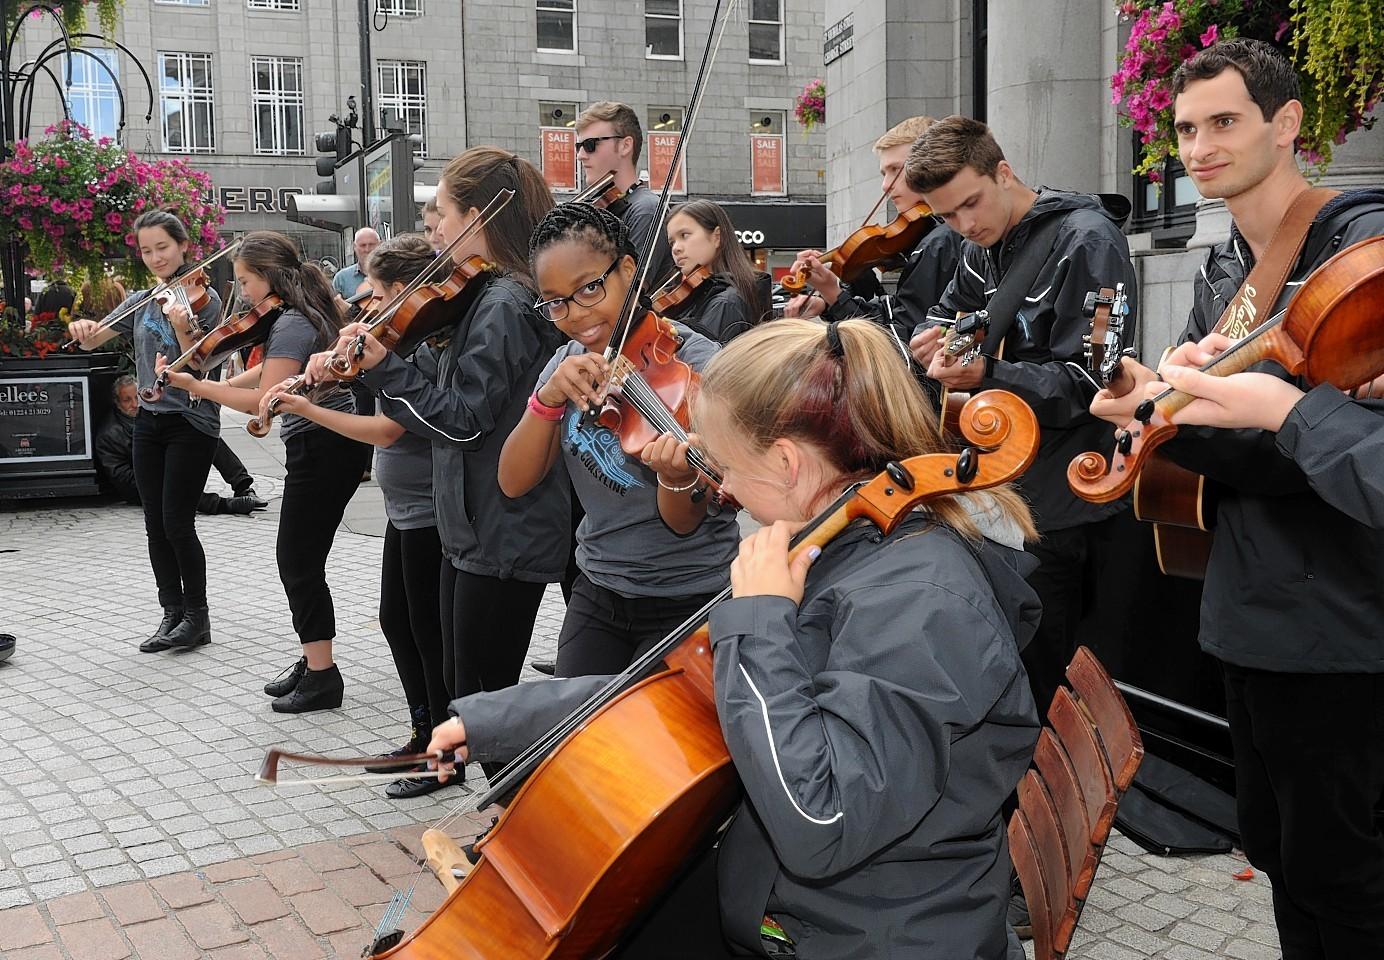 Aberdeen International Youth Festival. 'Coastline' from Canada performing.